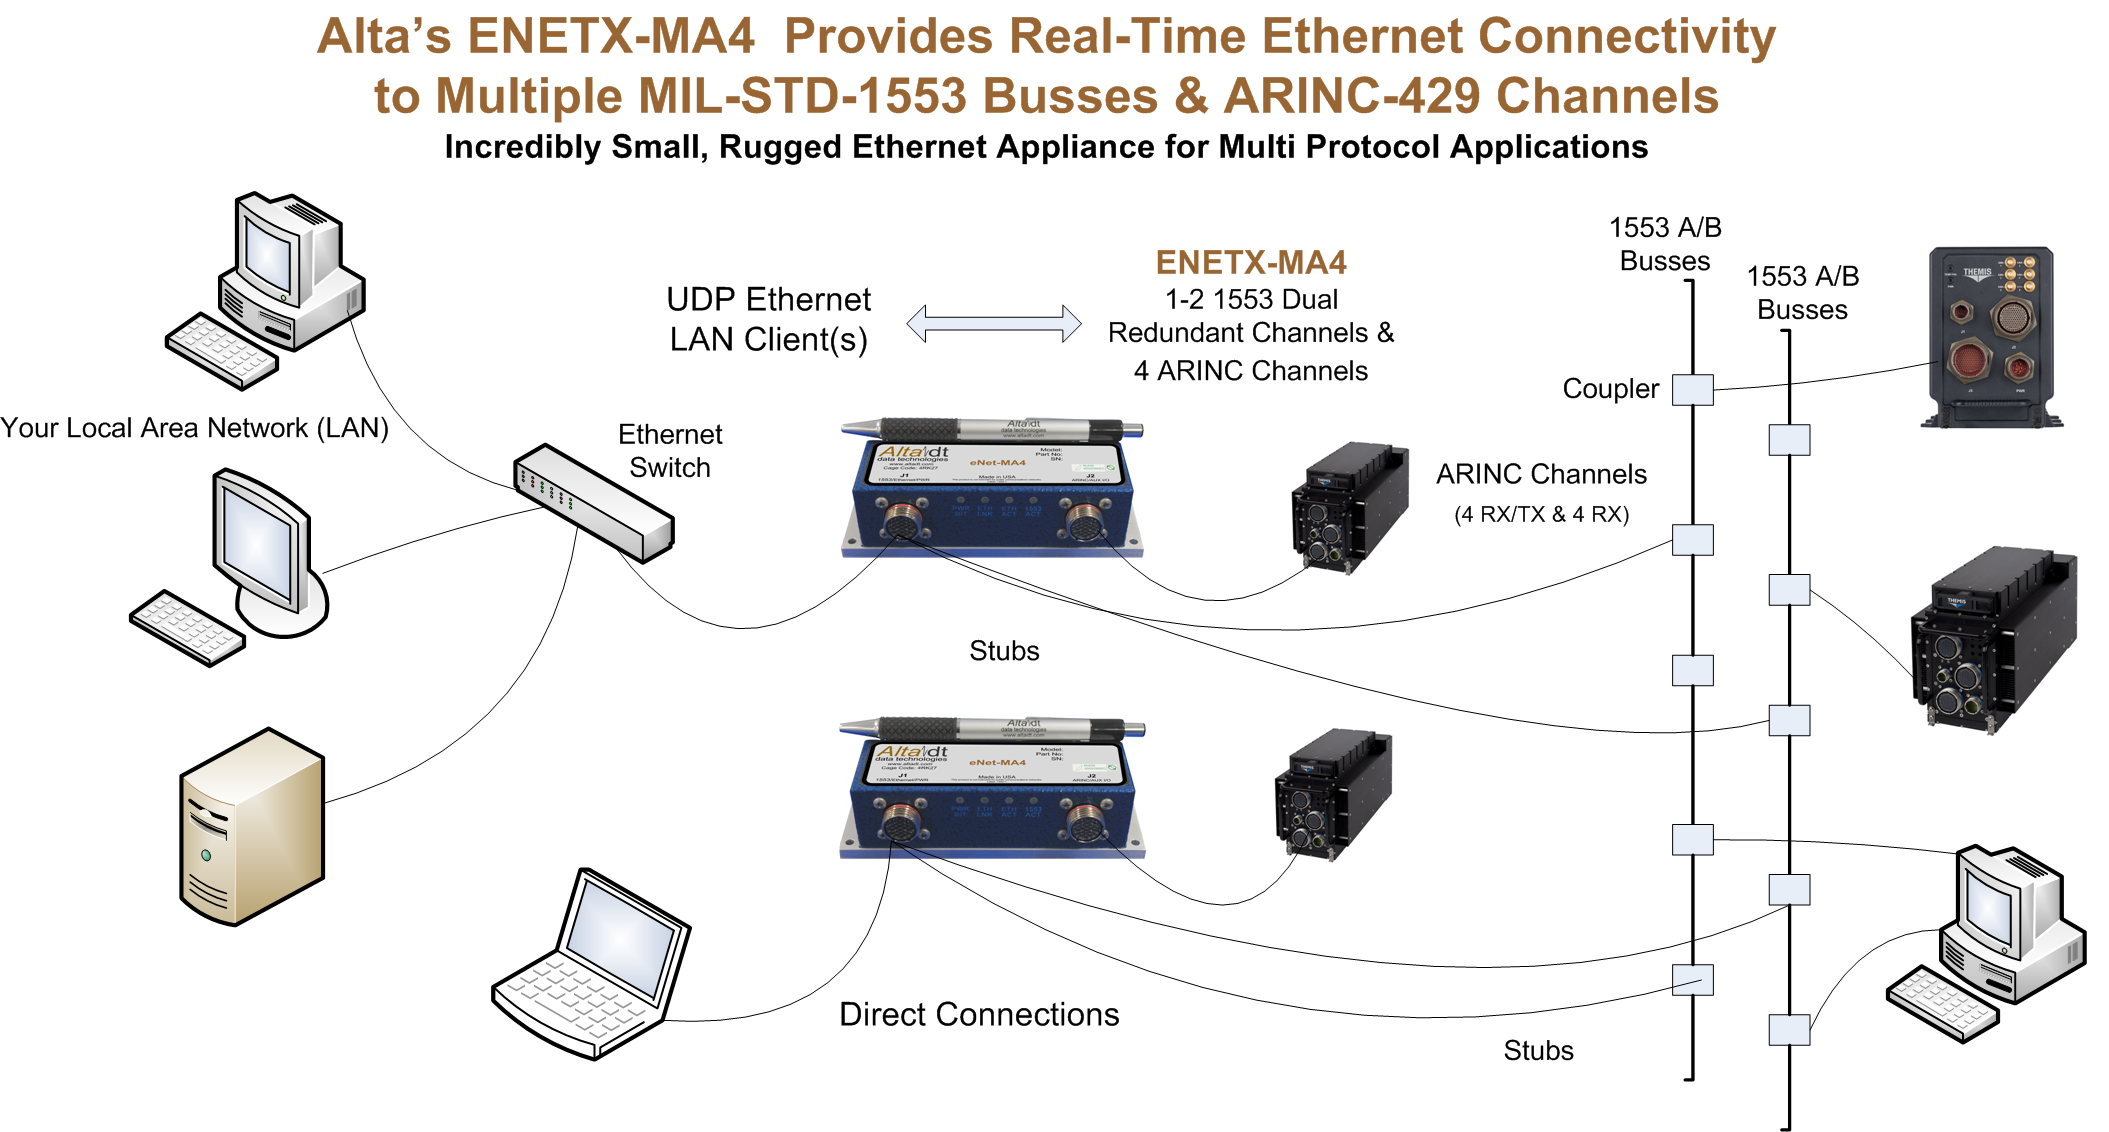 eNetX-MA4 Concepts